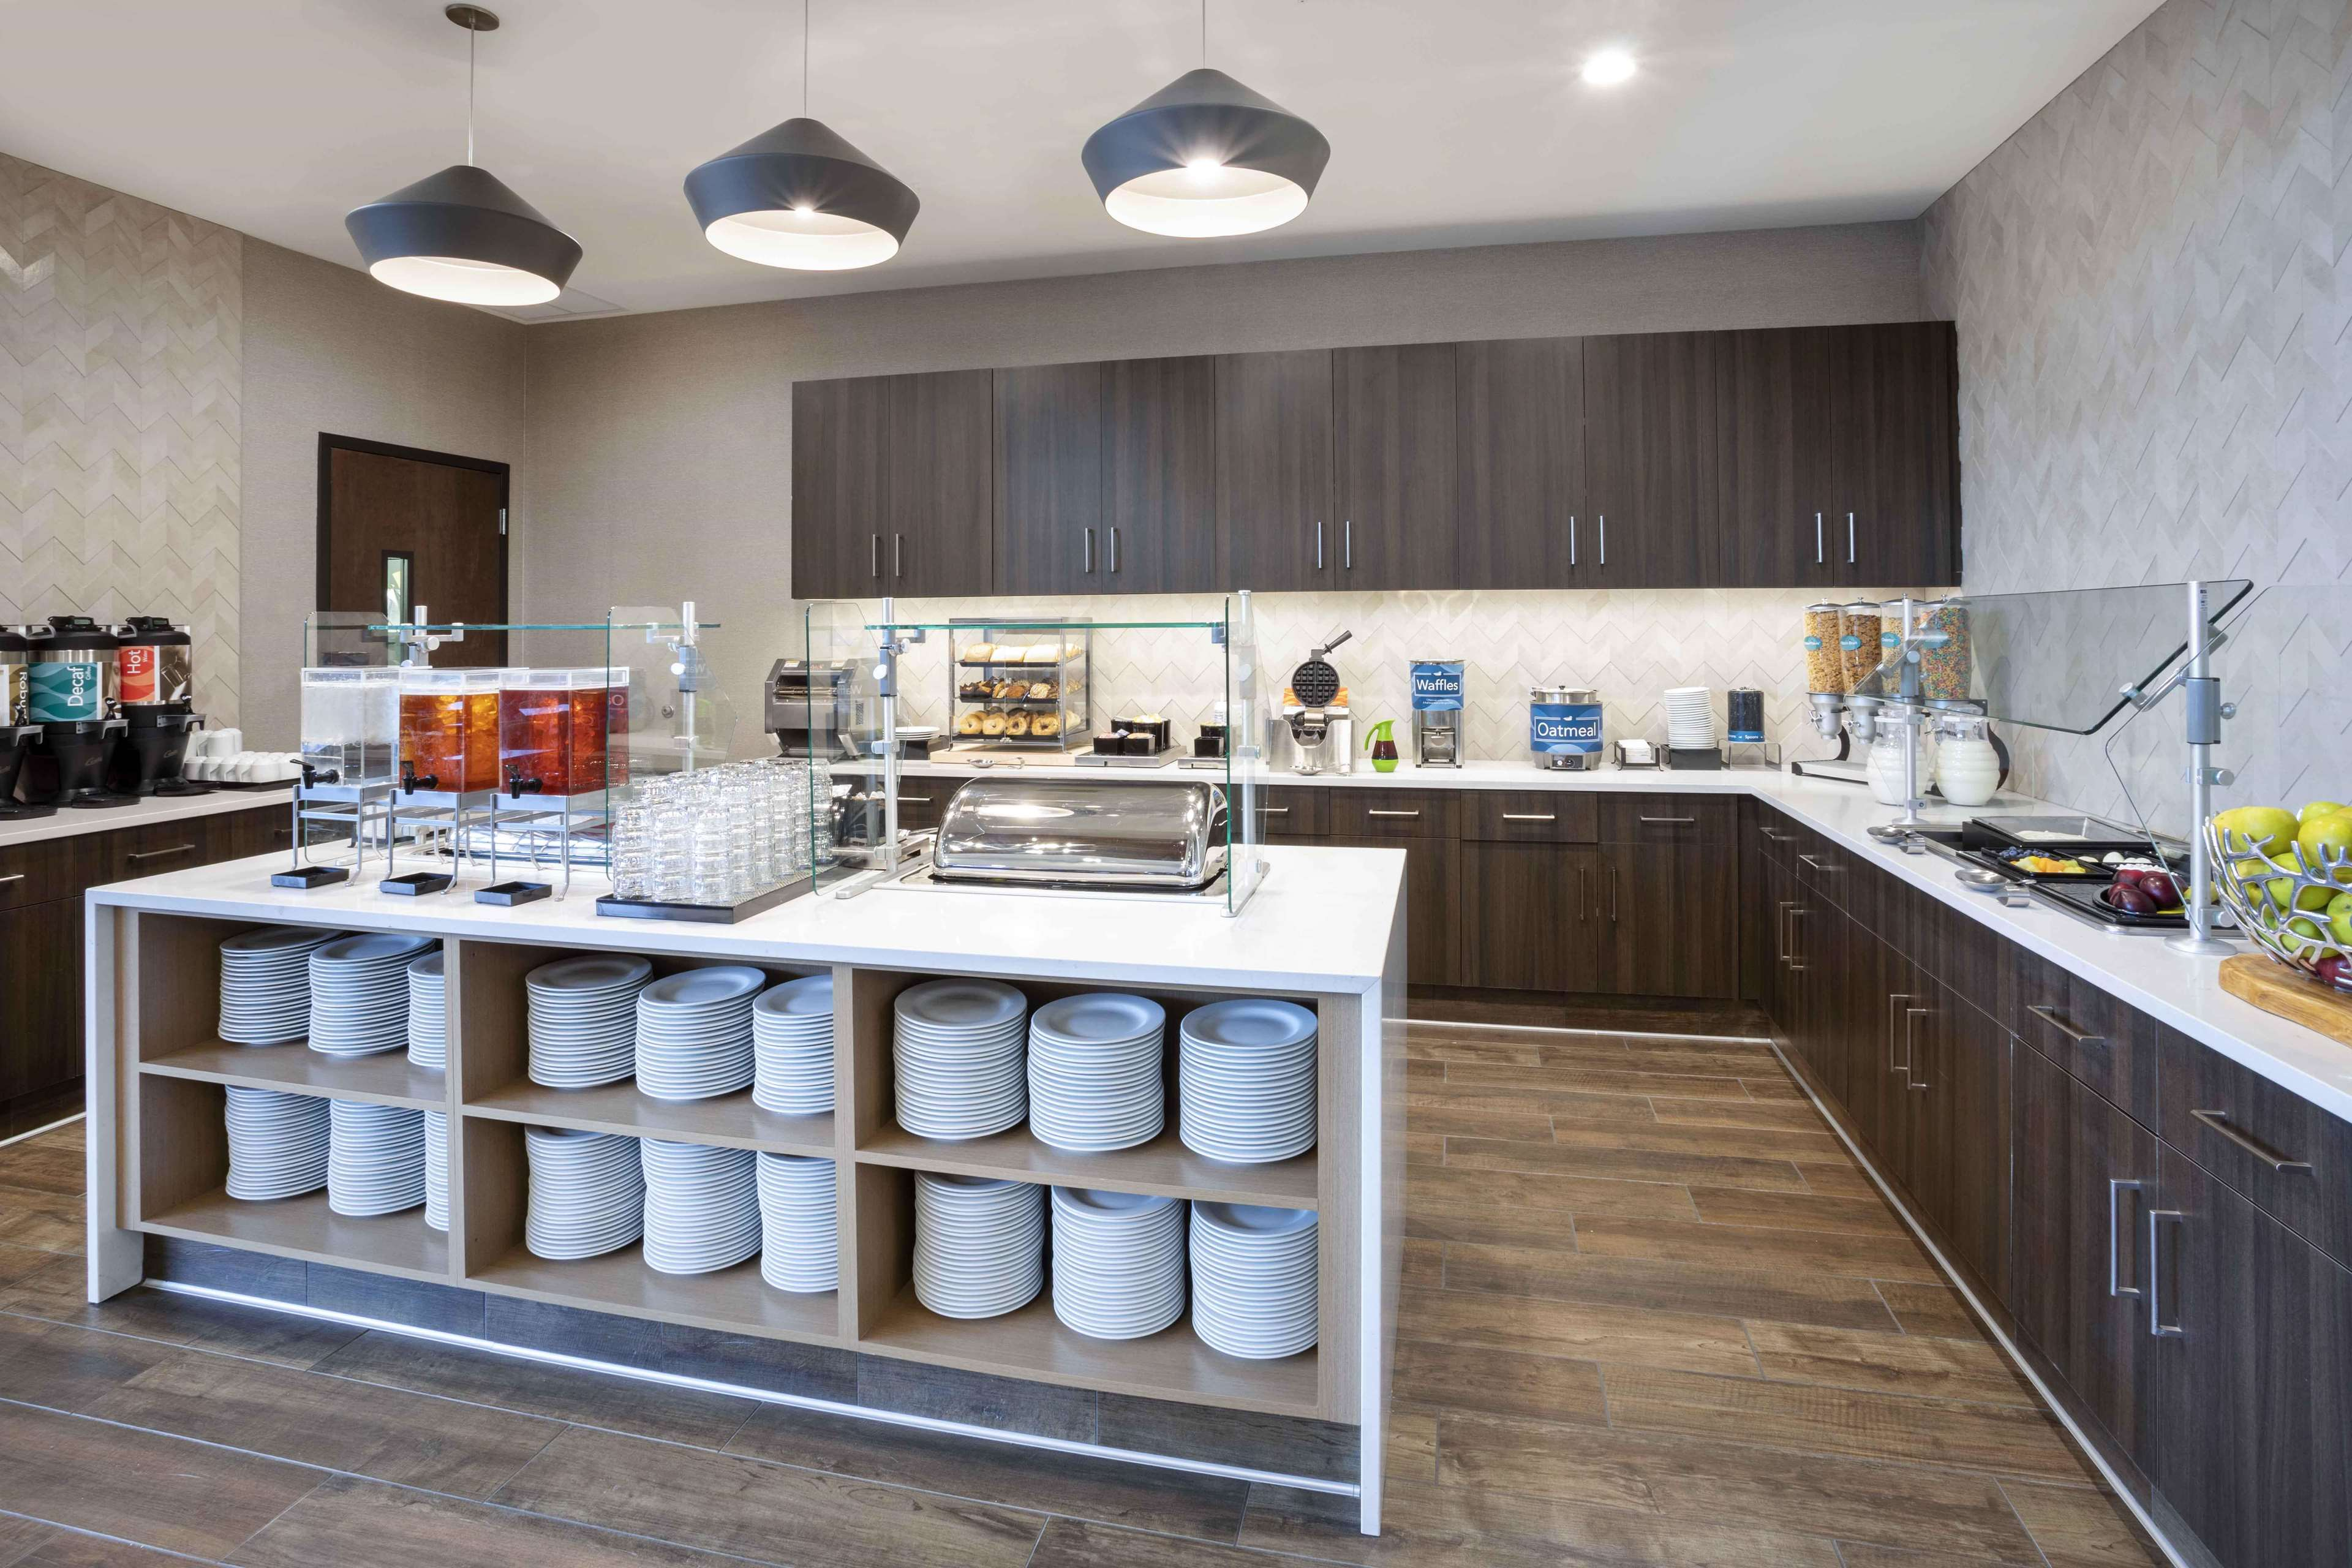 Homewood Suites by Hilton Edina Minneapolis image 11